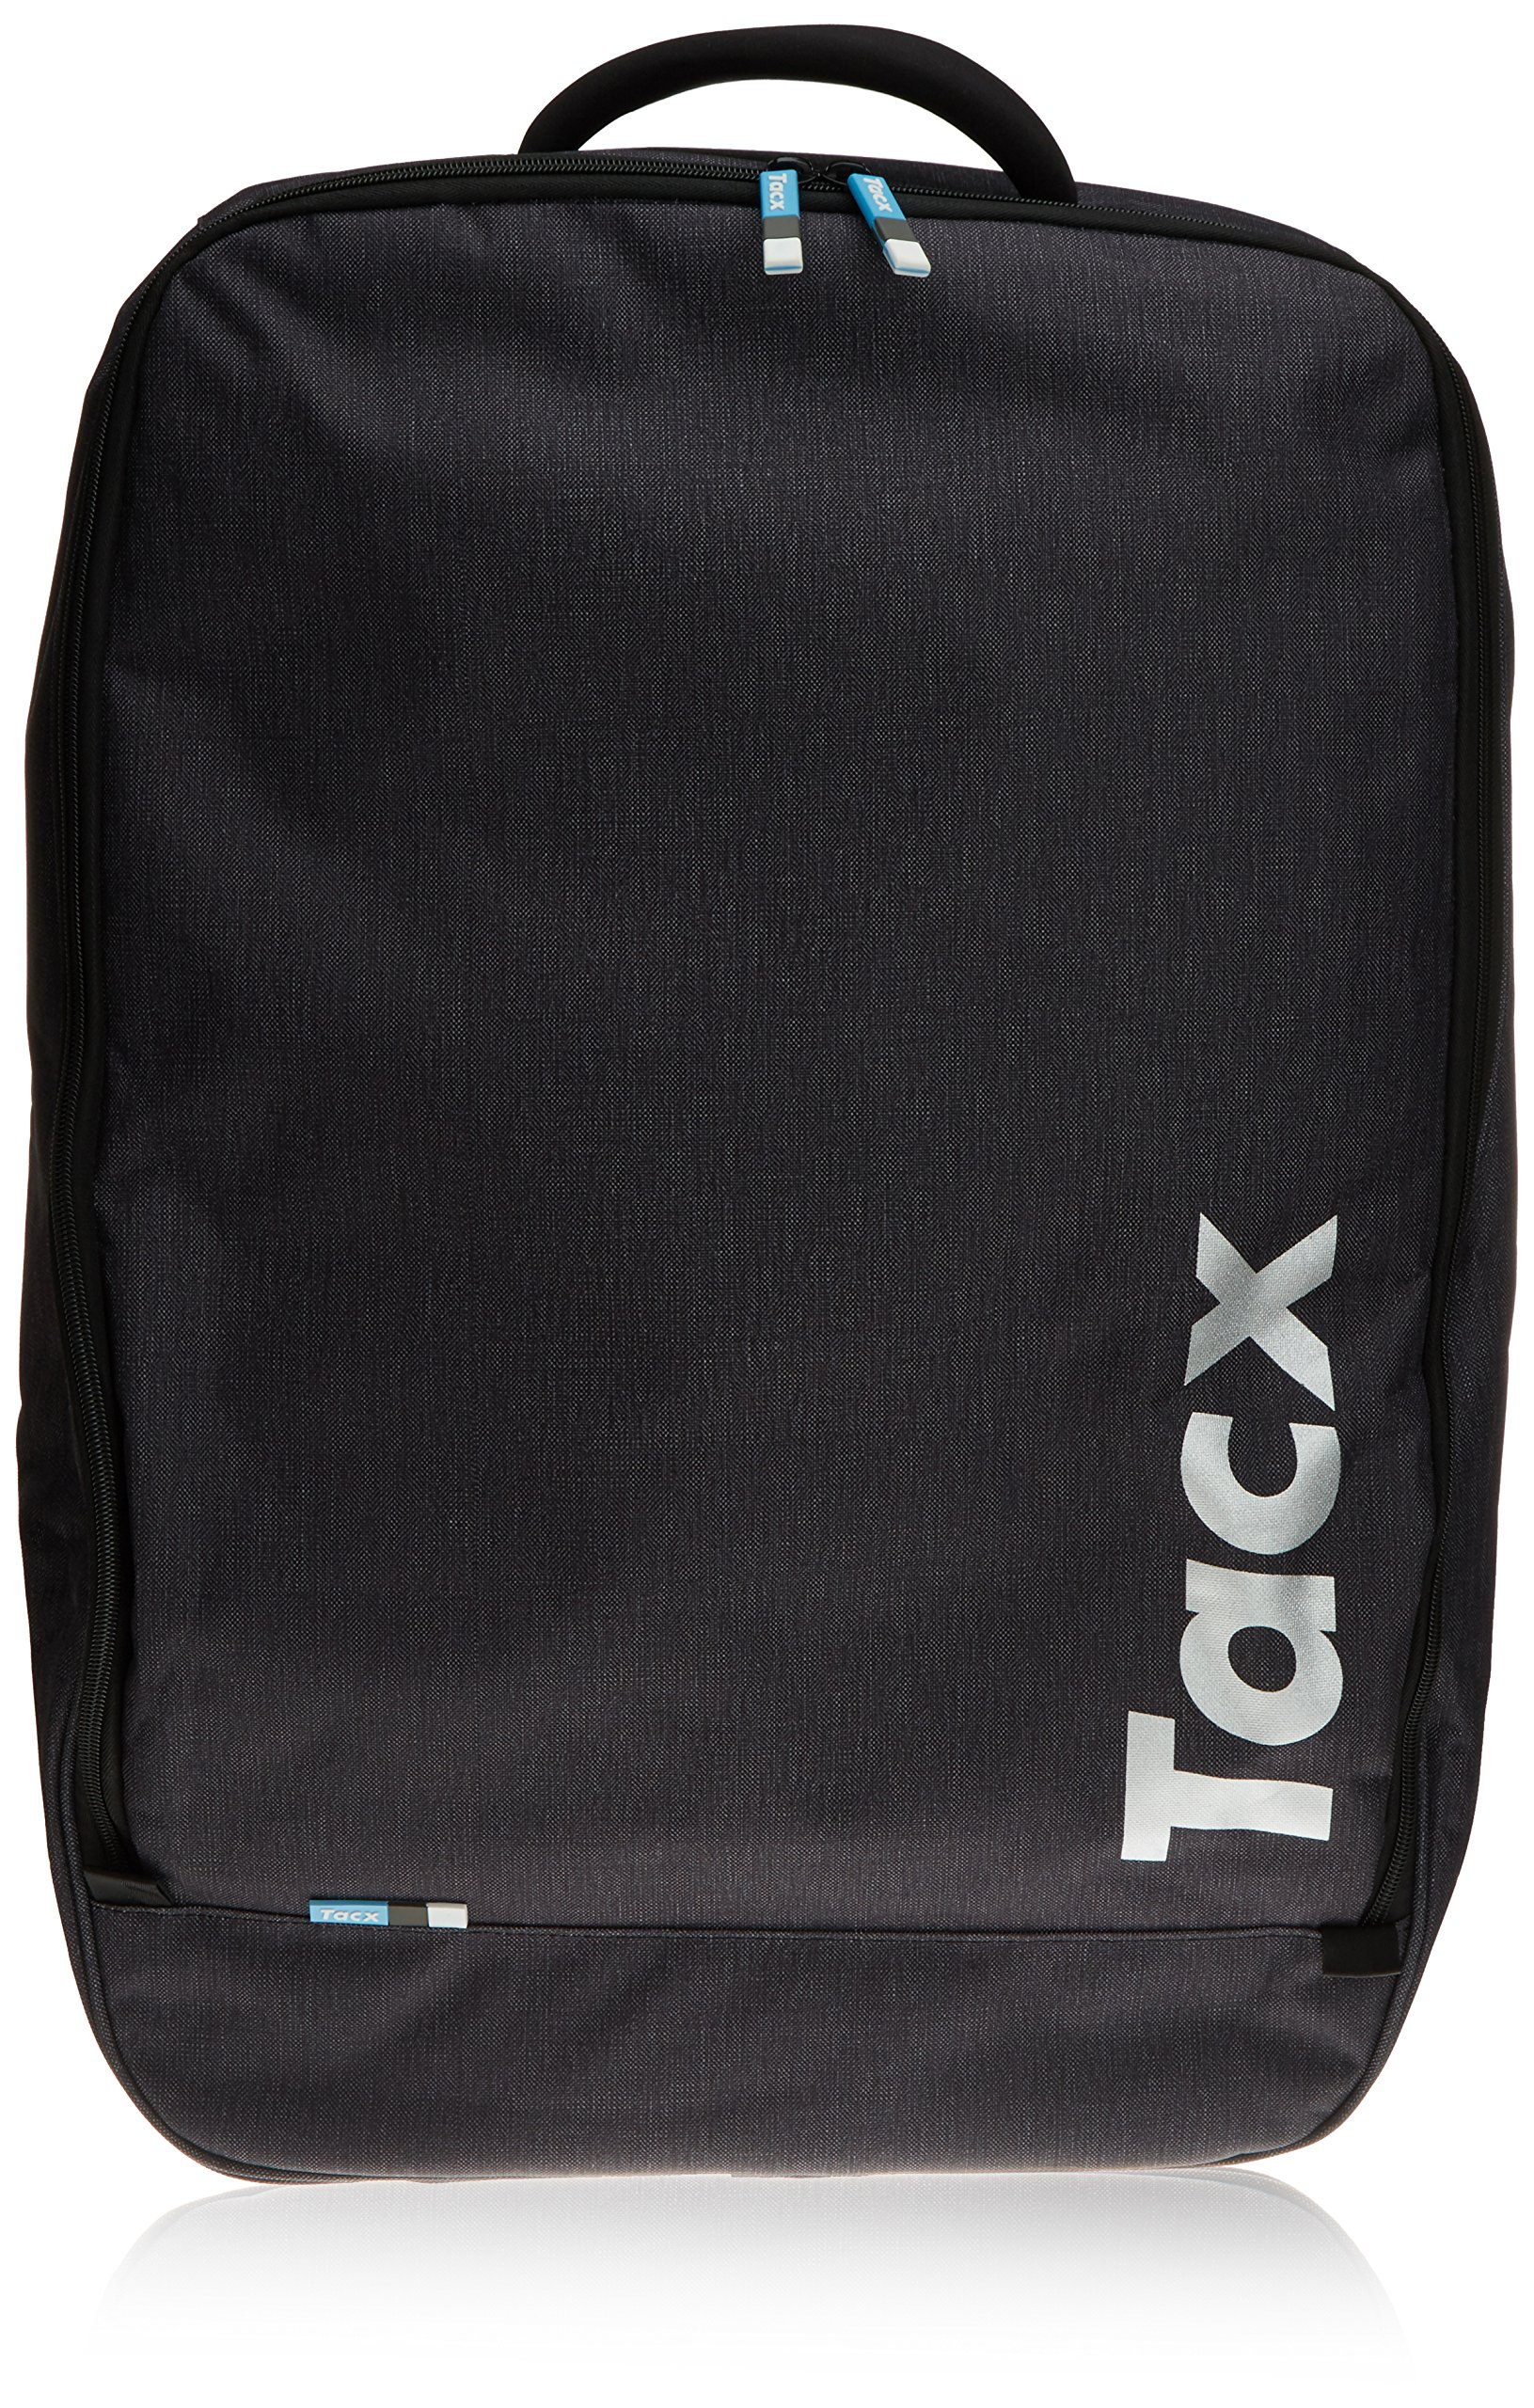 Tacx Trainer Bag, Grey